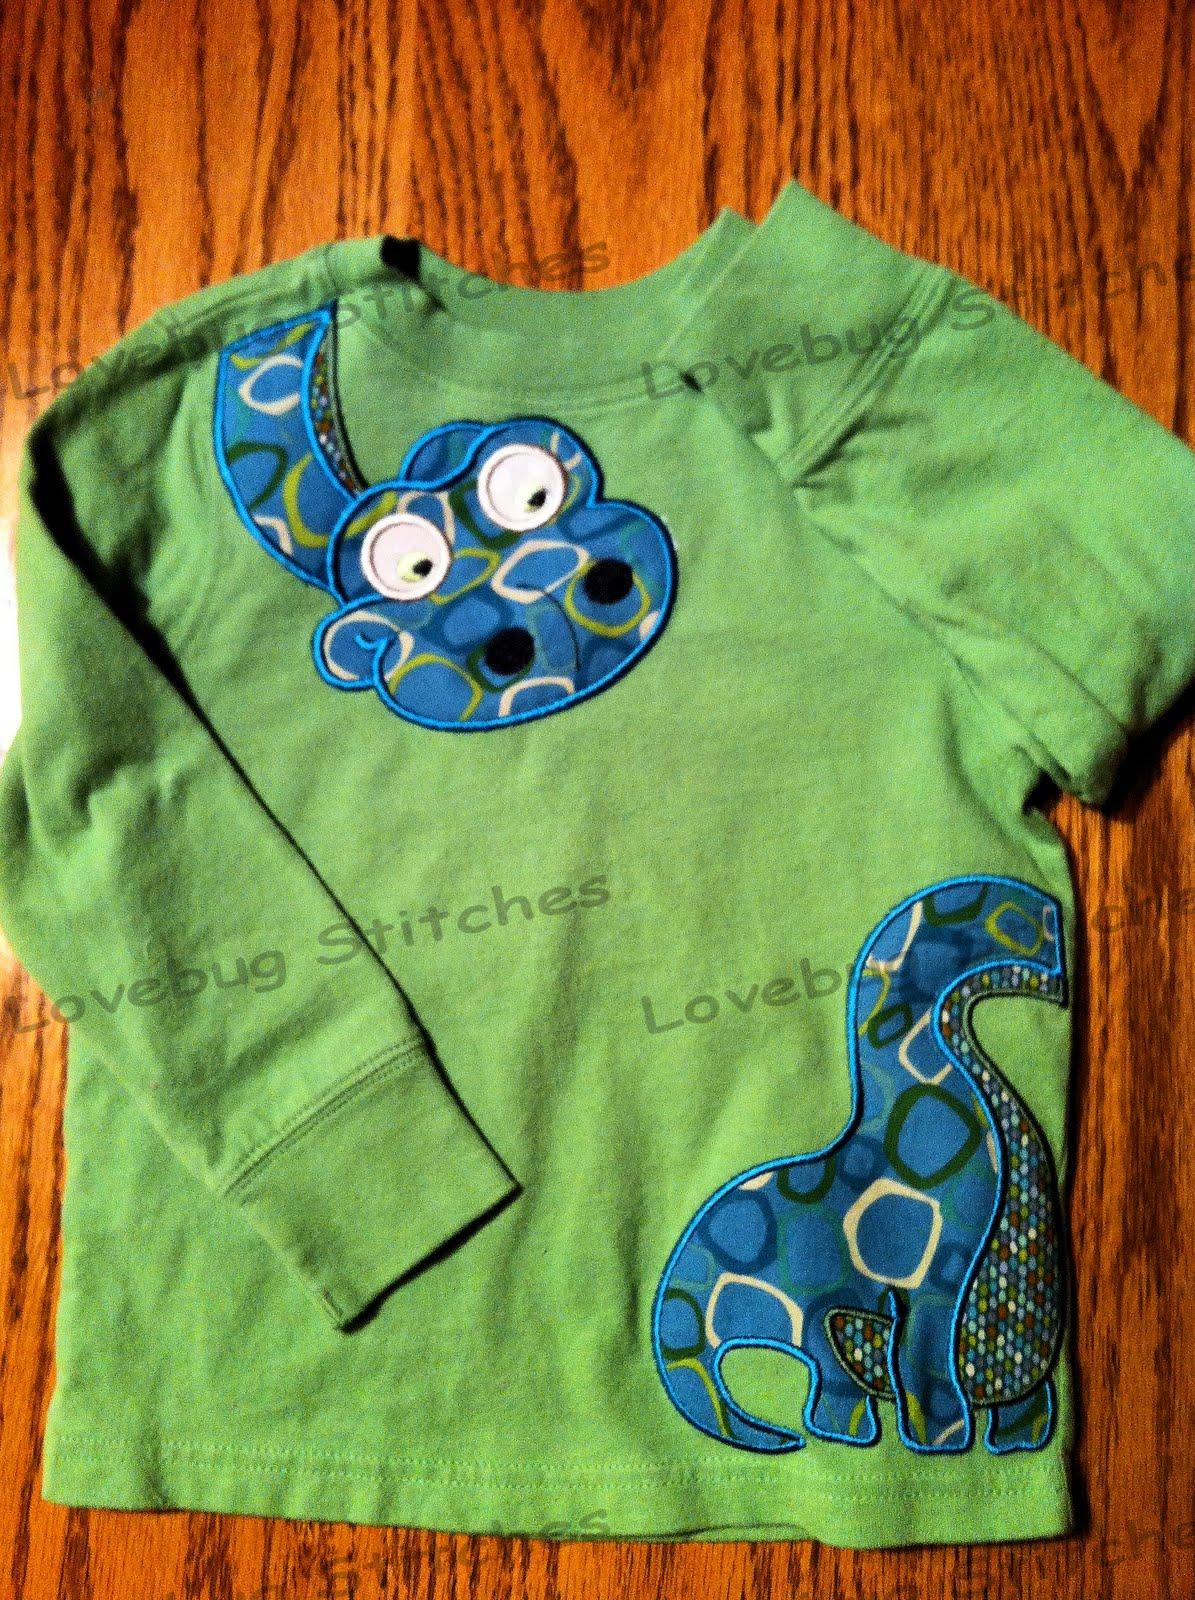 Lovebug stitches new item dinosaur shirt for Girly dinosaur fabric